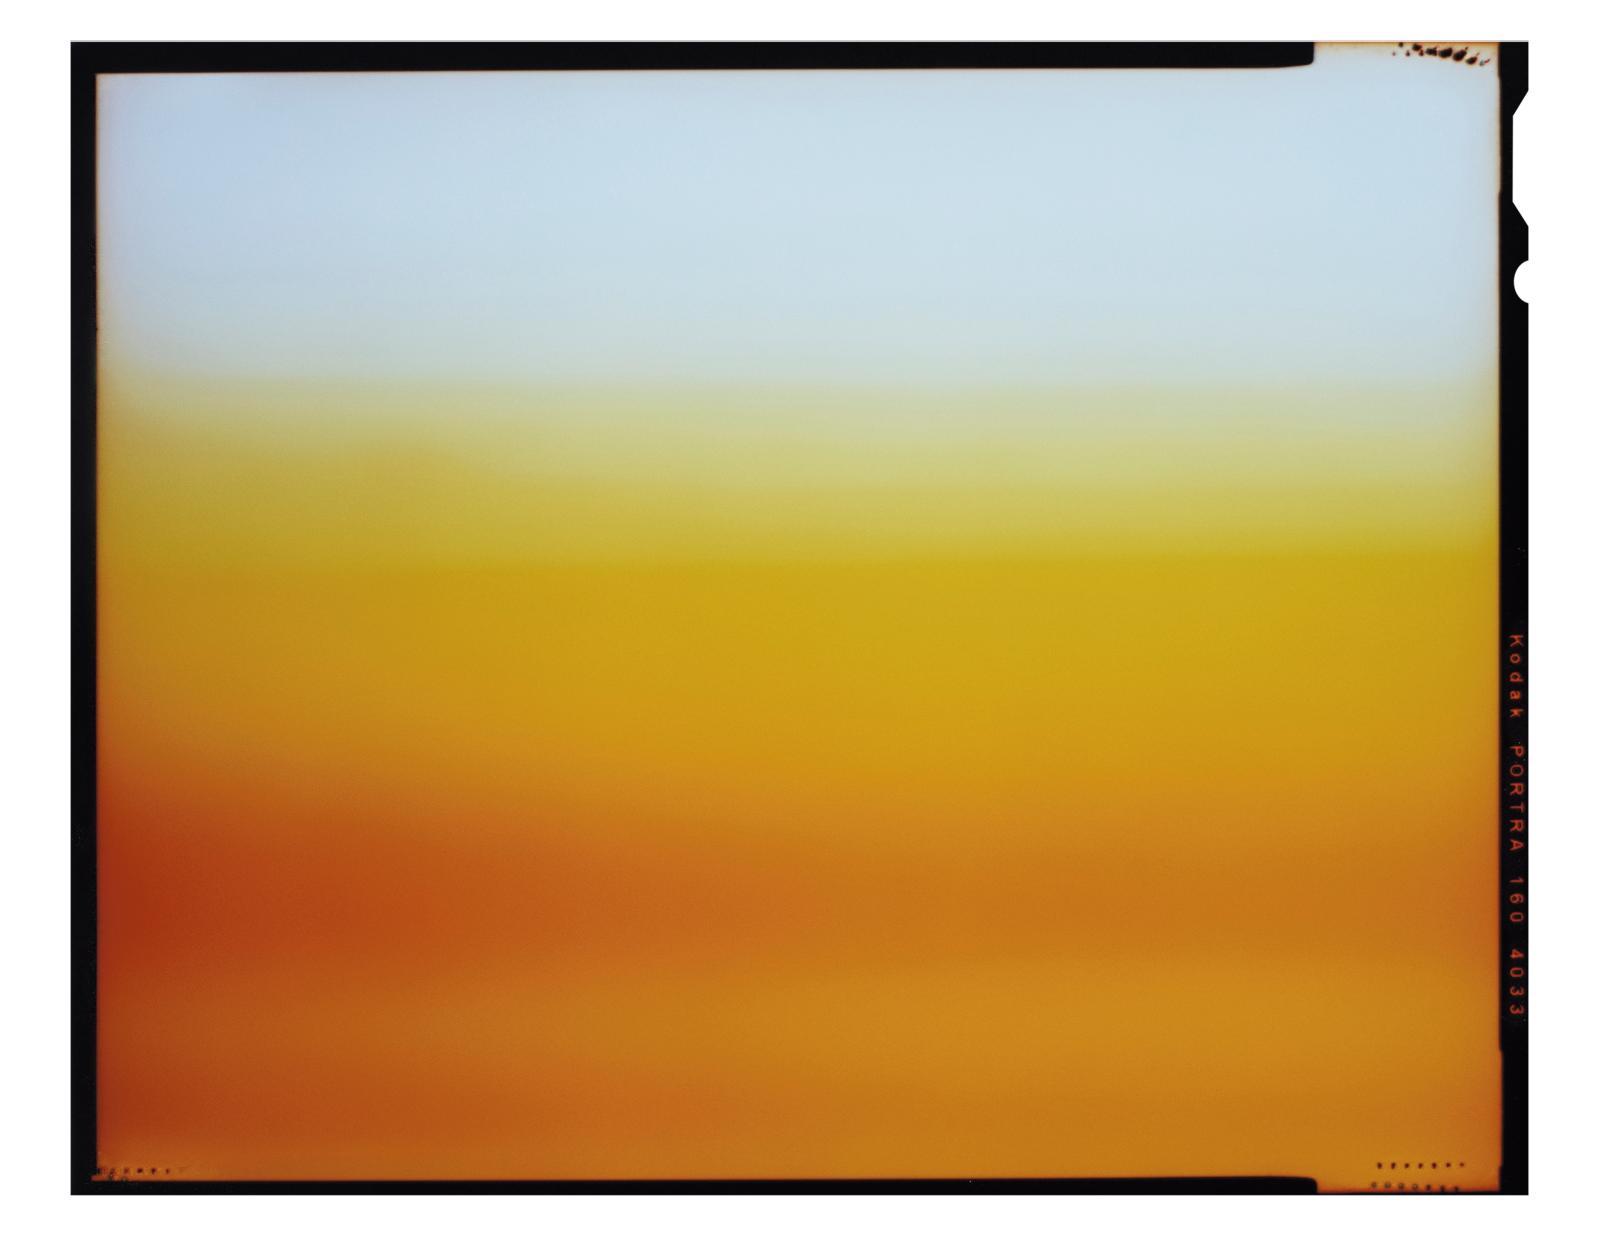 Thomas Paquet, Horizon #9, 2019, 94x18 cm, galerie Thierry Bigaignon. COURTESY GALERIE THIERRY BIGAIGNON